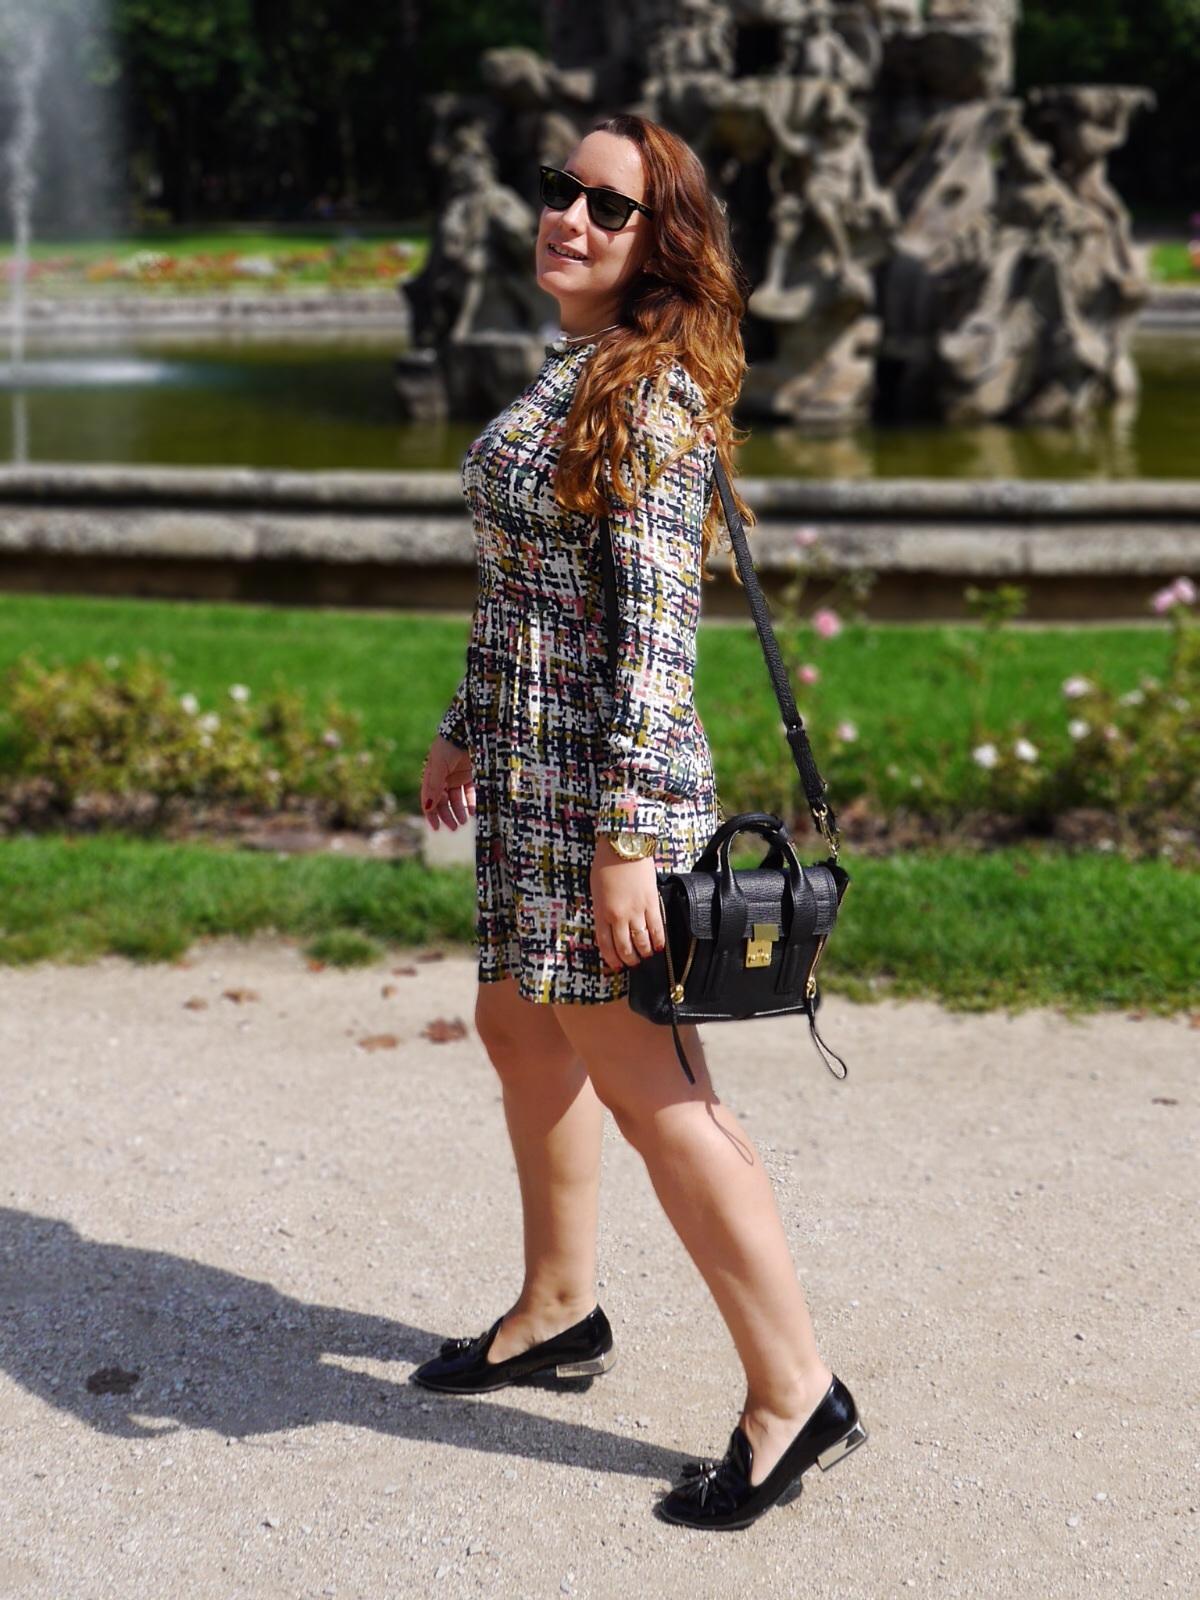 Street Style, De mayor quiero ser egoblogger, Zara dress, 3.1 Phillip Lim, Zara slippers, egoblogger, fashion blogger